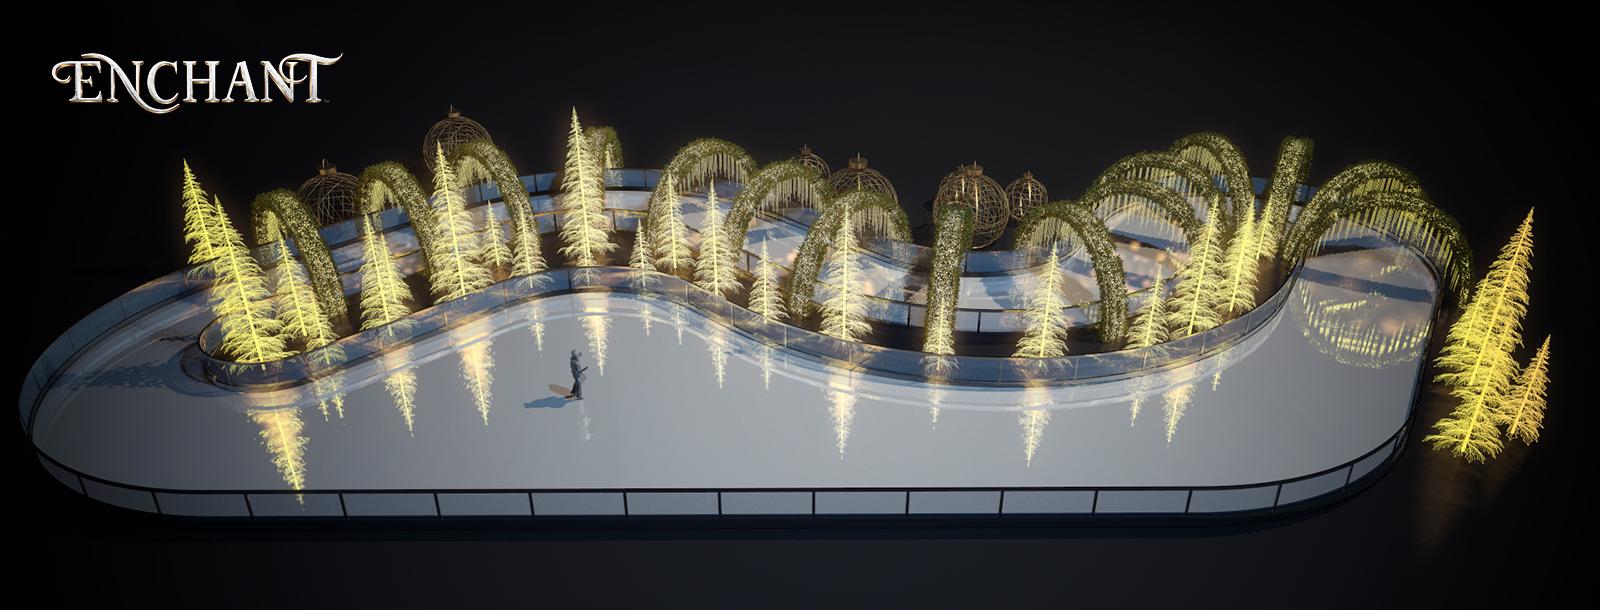 Enchant Christmas.Enchant Christmas New Ice Skating Trail For 2018